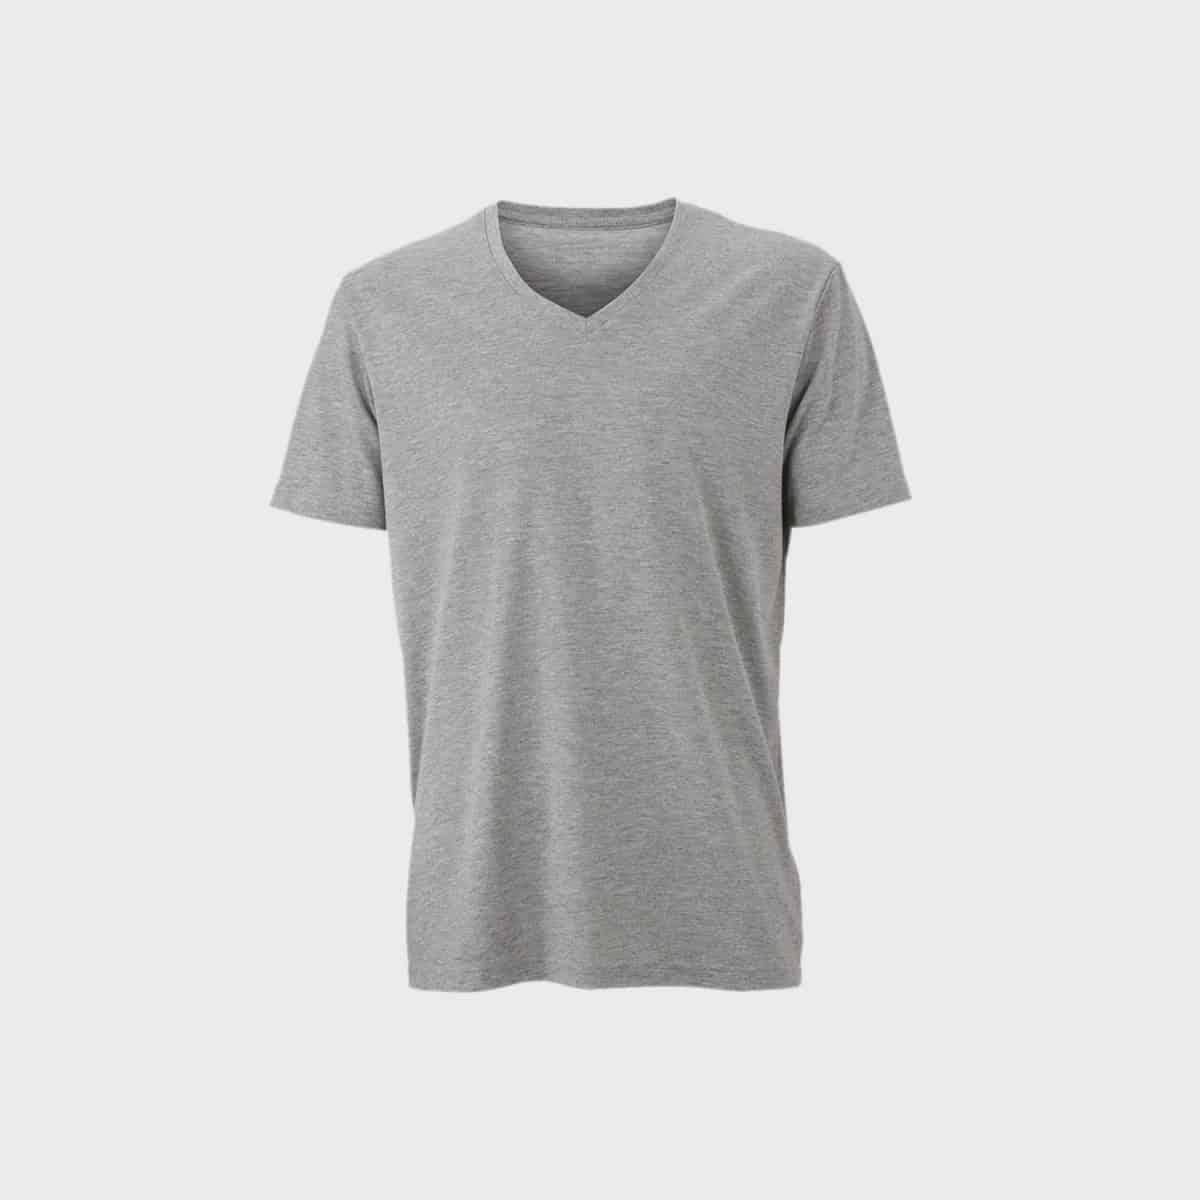 Daiber T Shirts JN974 Greyheather Front